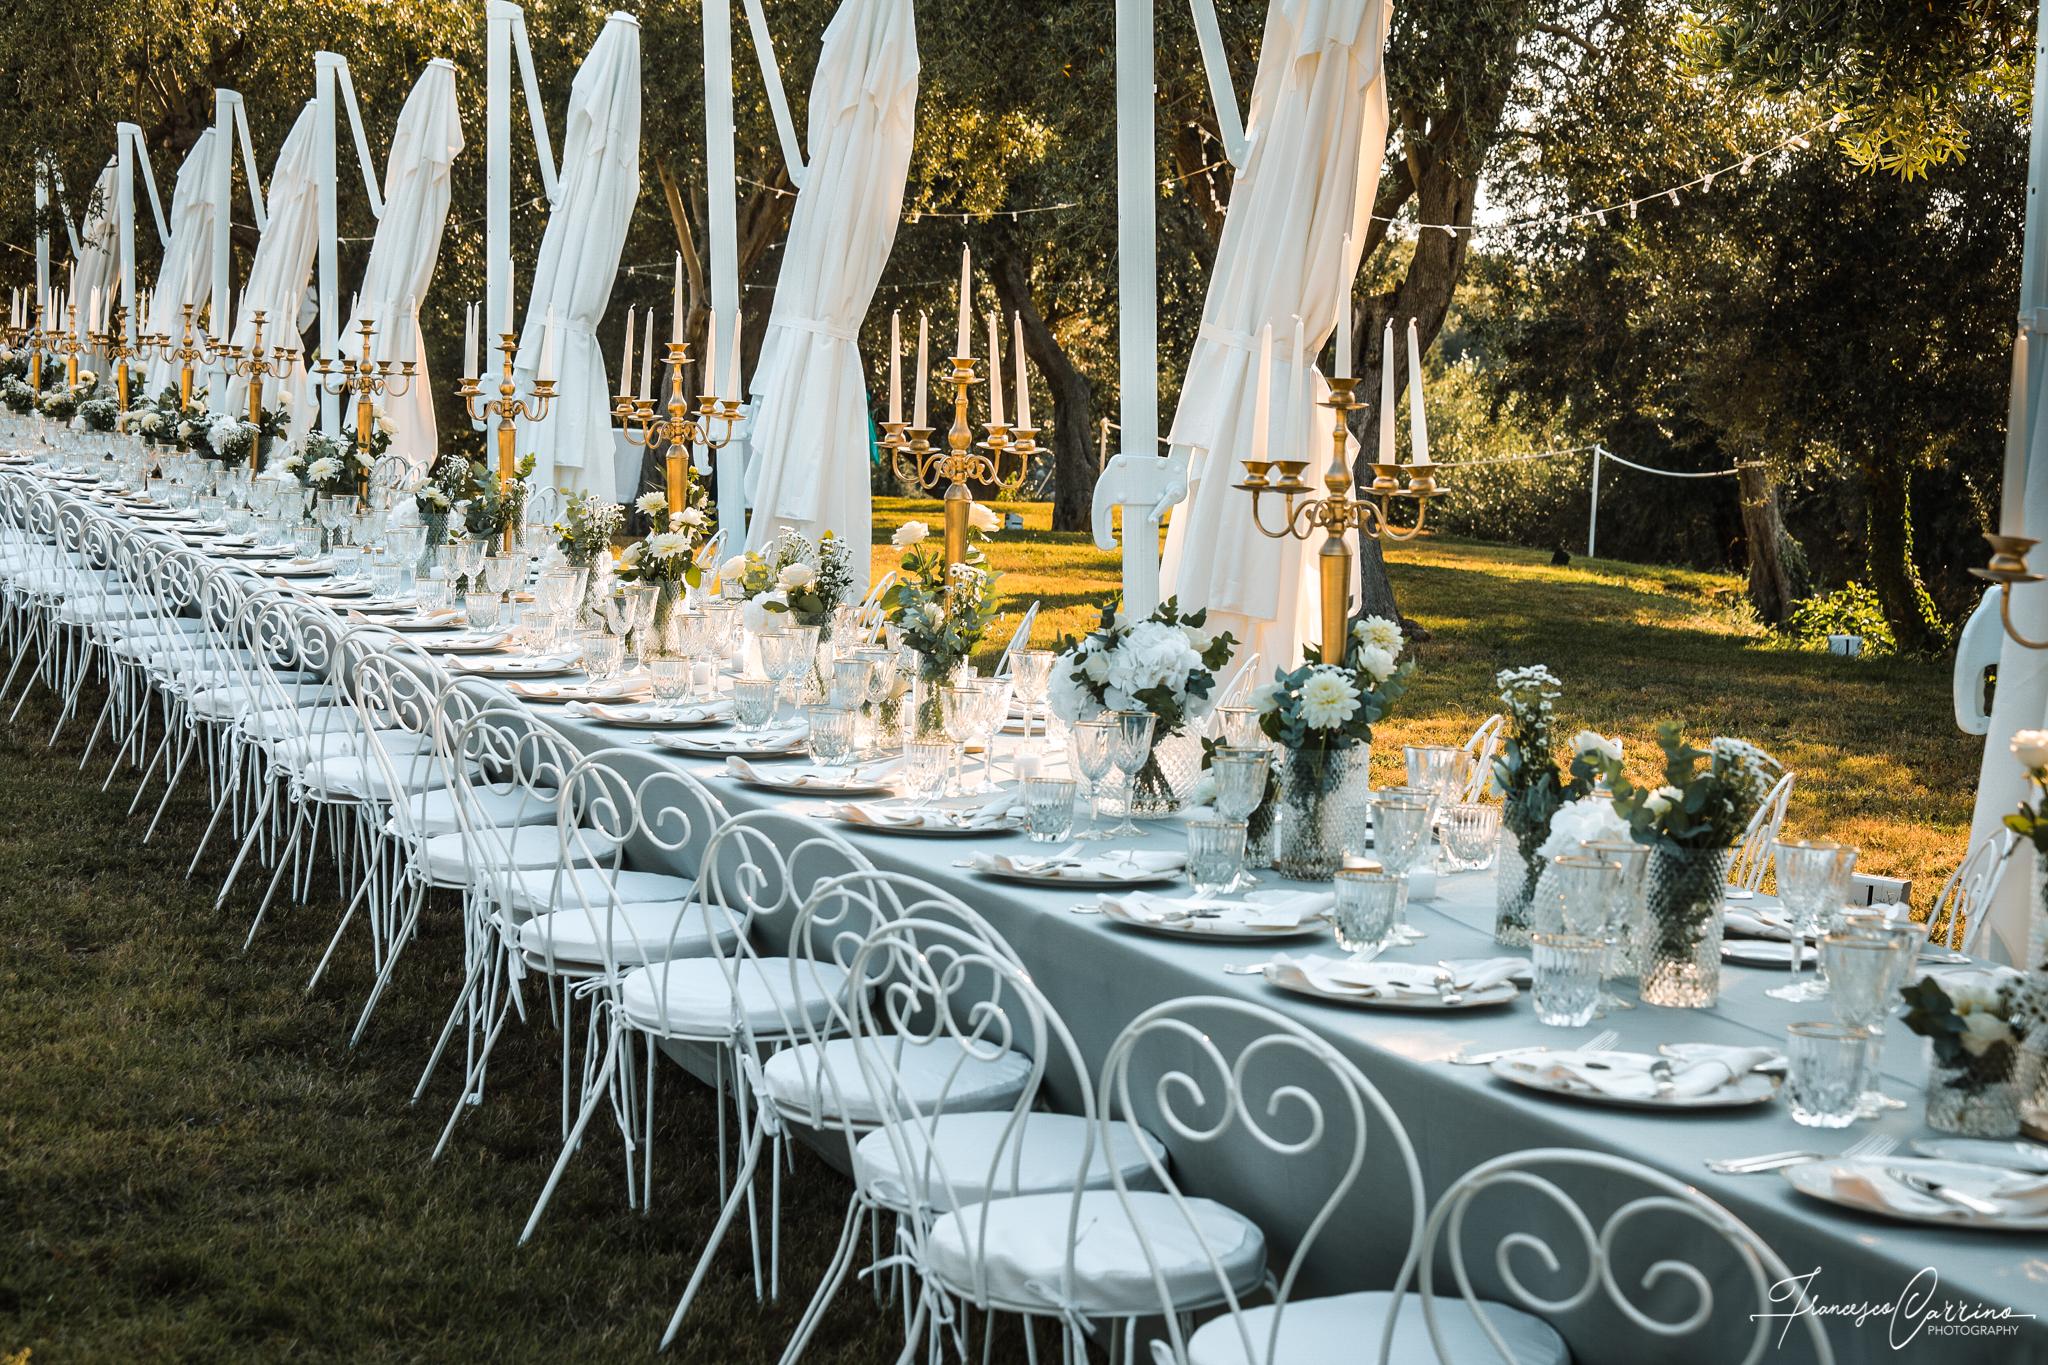 https://www.weddingamalfi.com/wp-content/uploads/Giannenza-13-luglio-2019-11.jpg